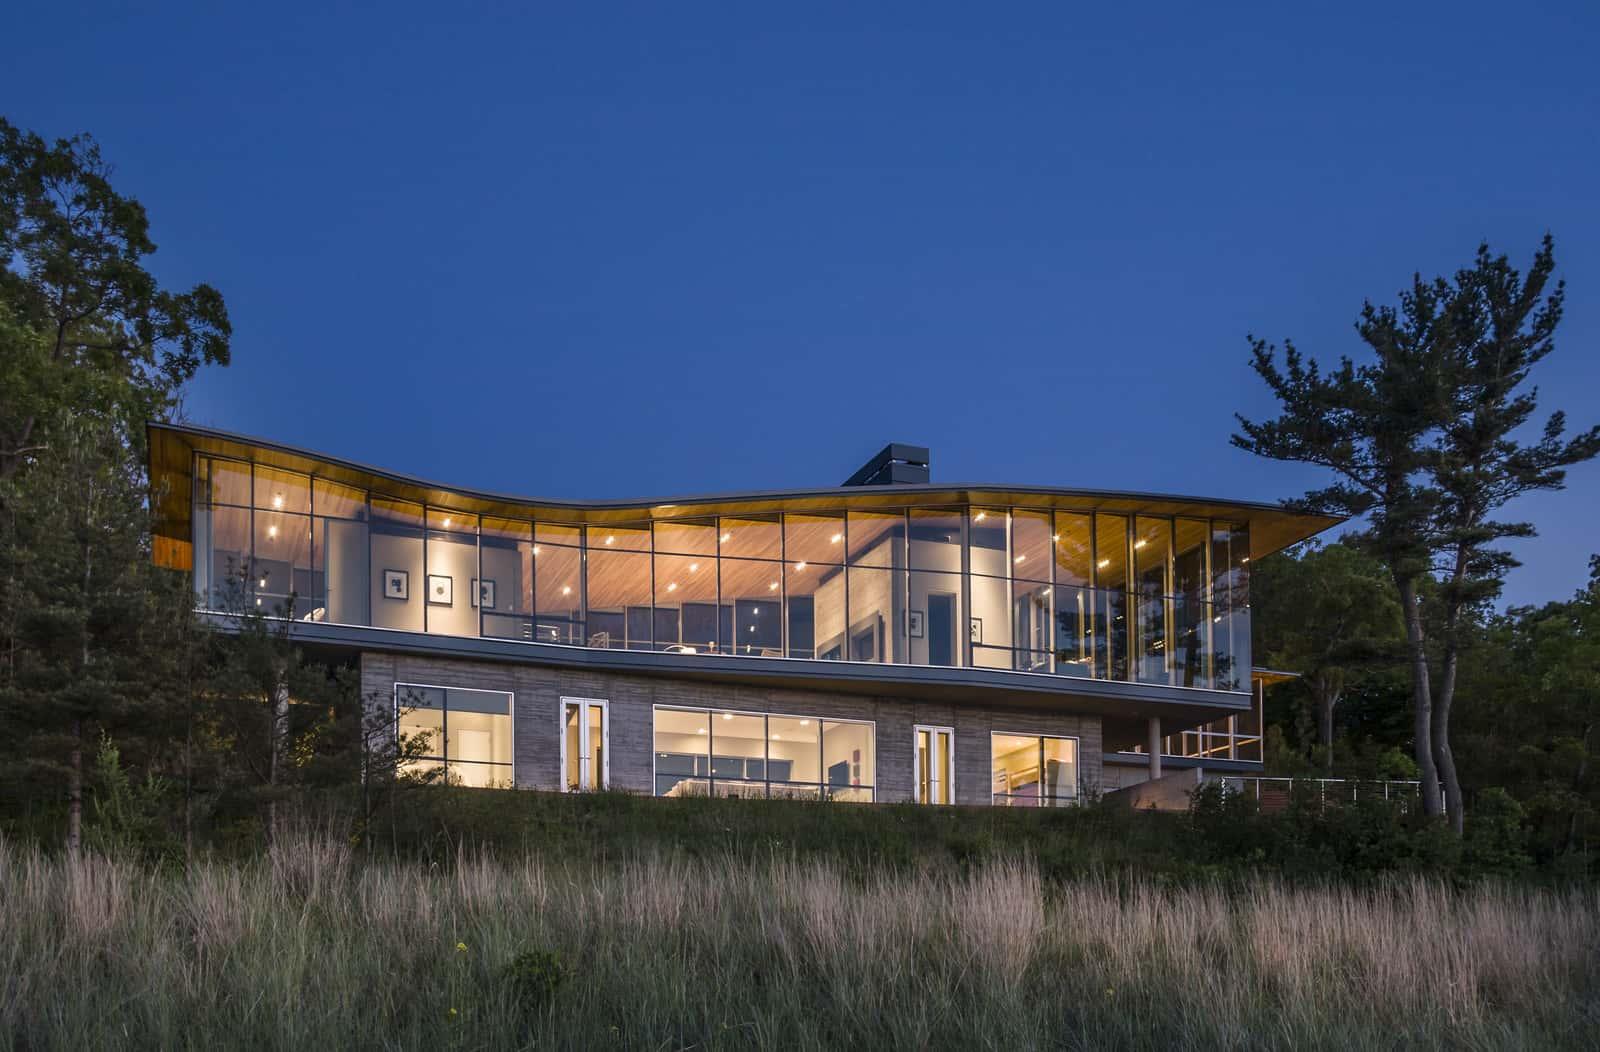 outside kitchen designs small islands modern beach homes | exterior design